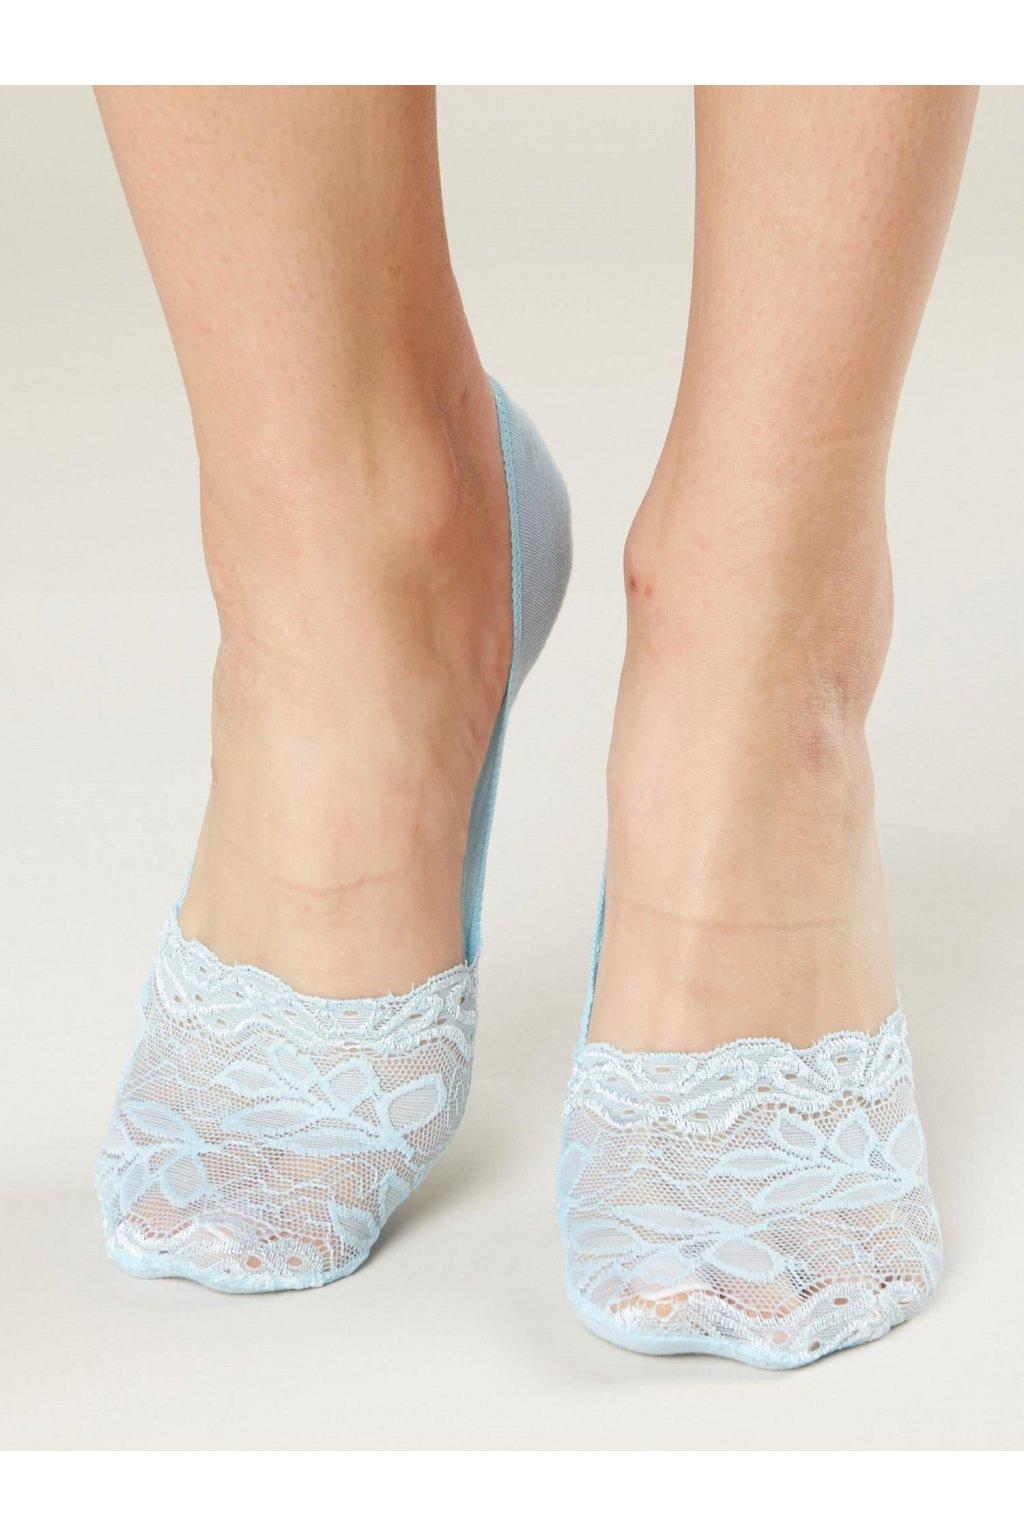 Dámske ponožky kód 7-SR-WSWC030(1)